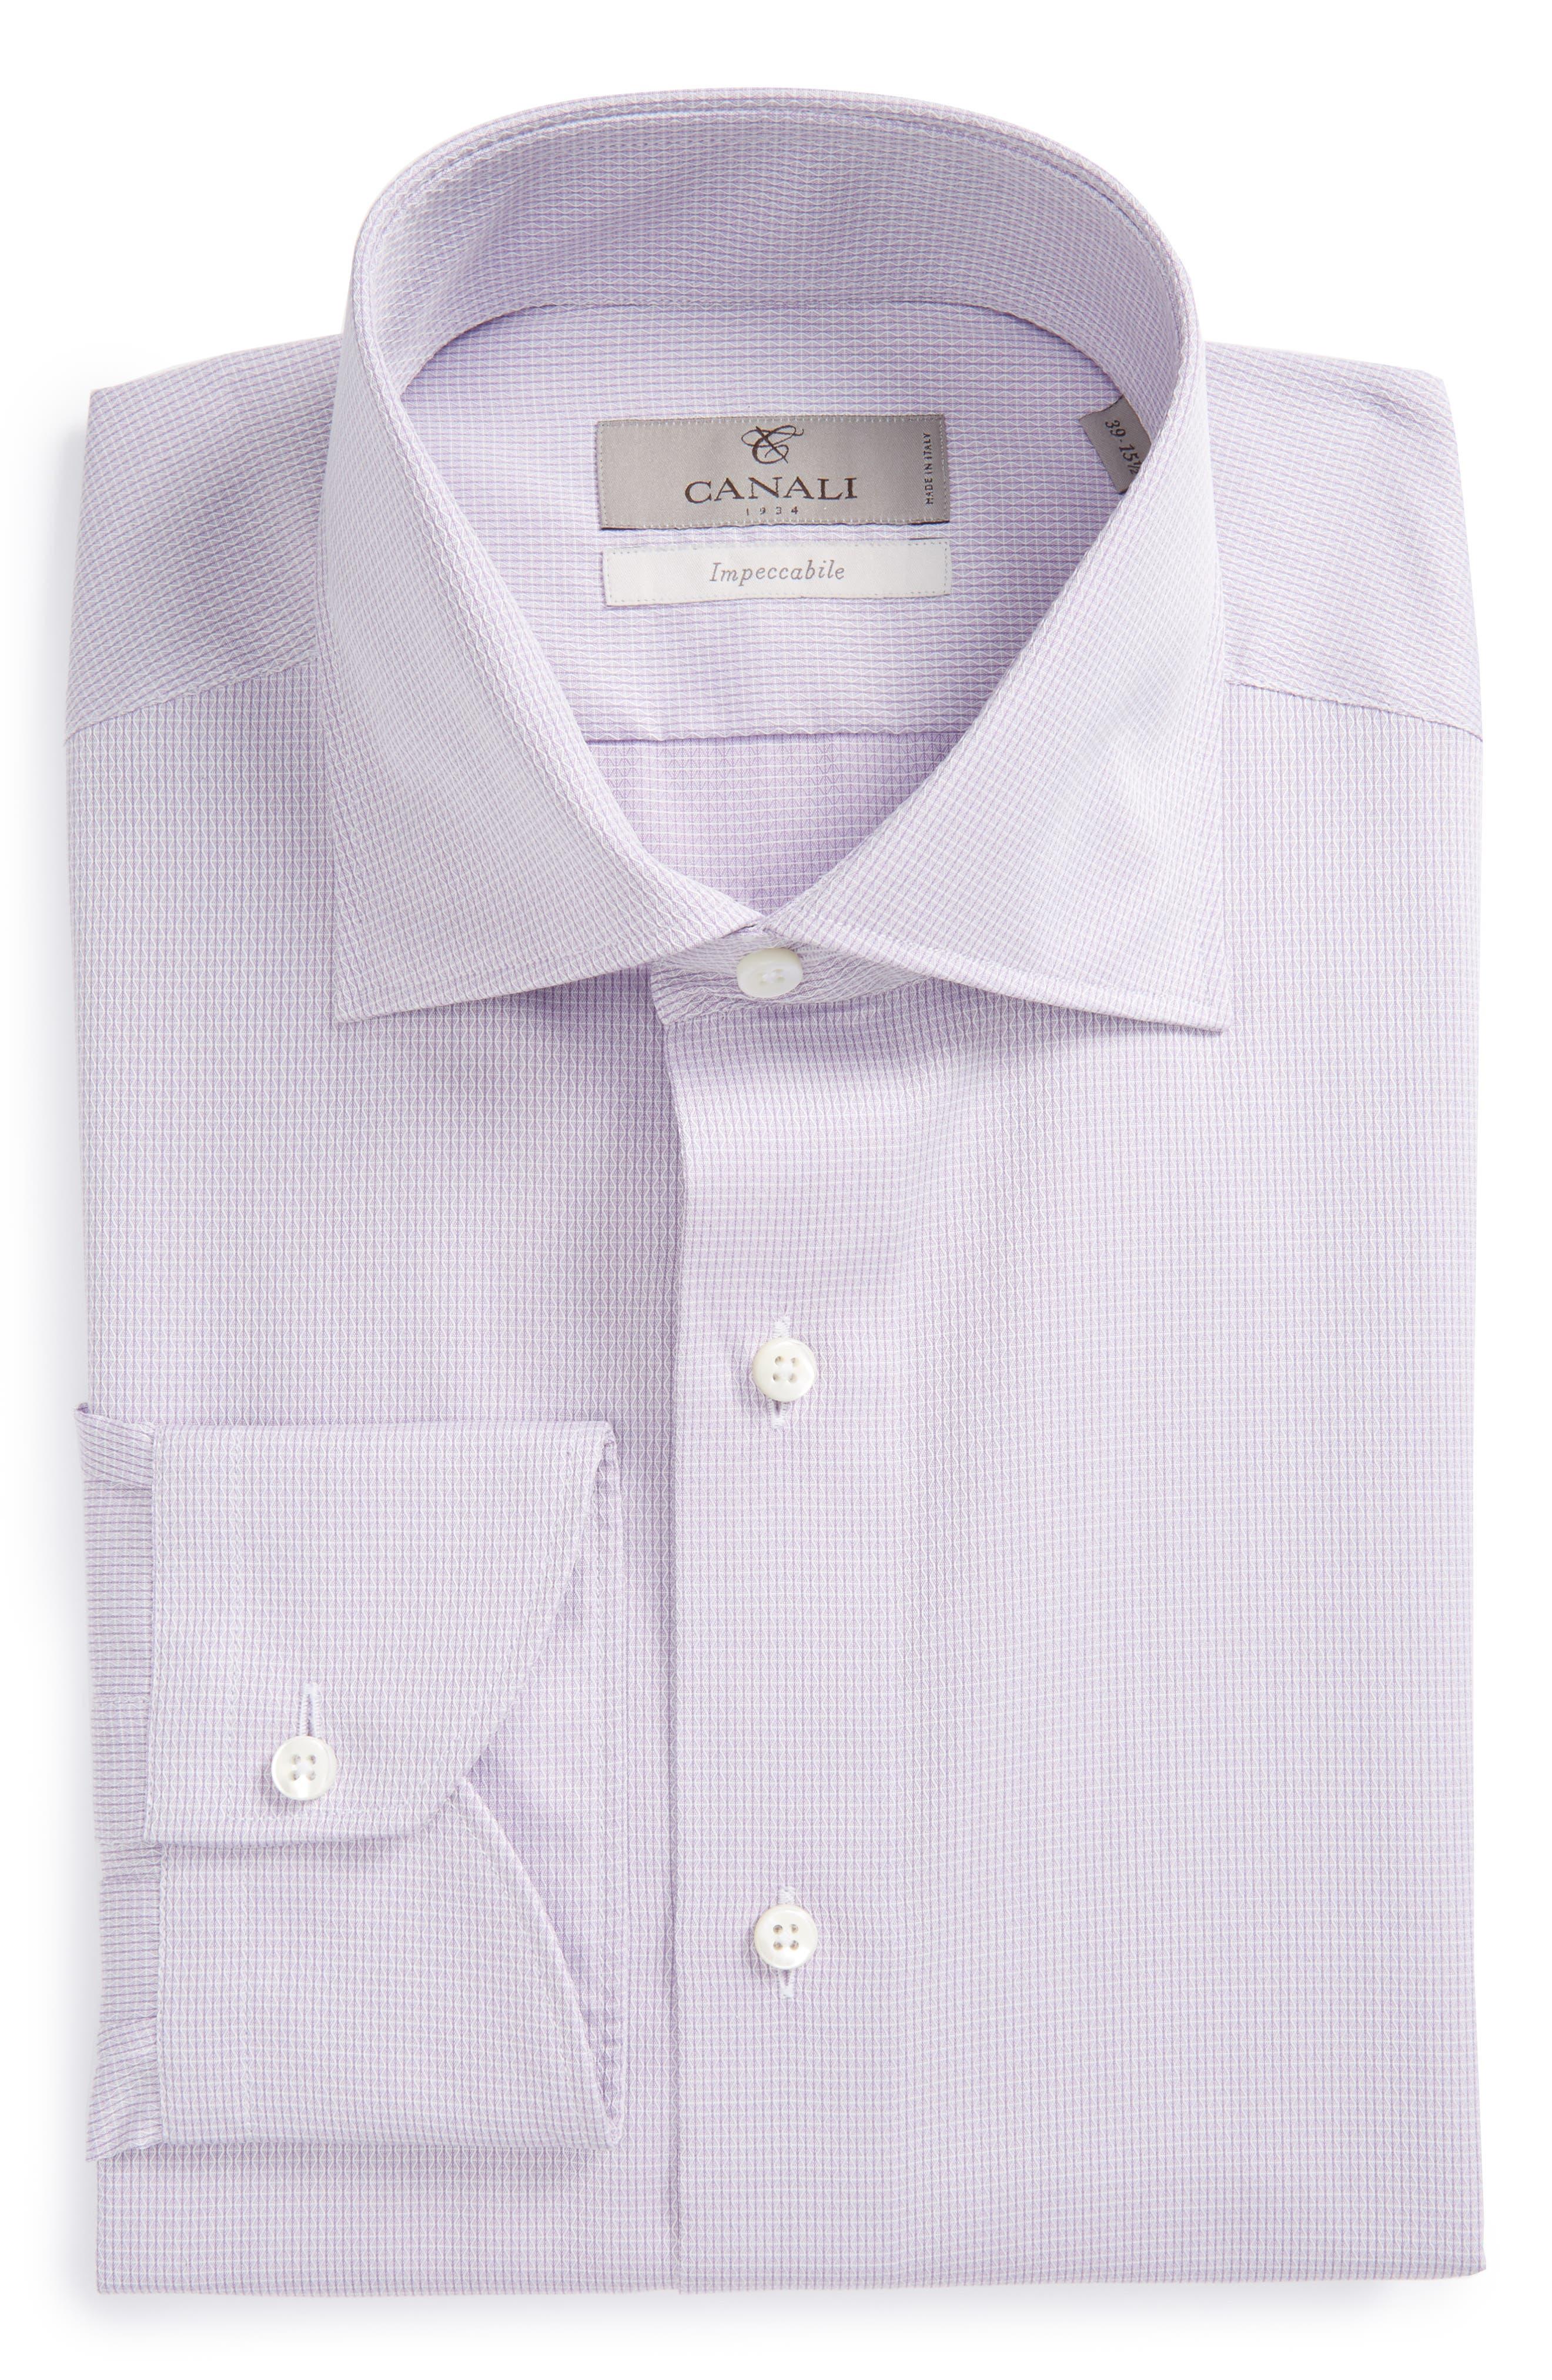 Regular Fit Geometric Dress Shirt,                             Main thumbnail 1, color,                             510